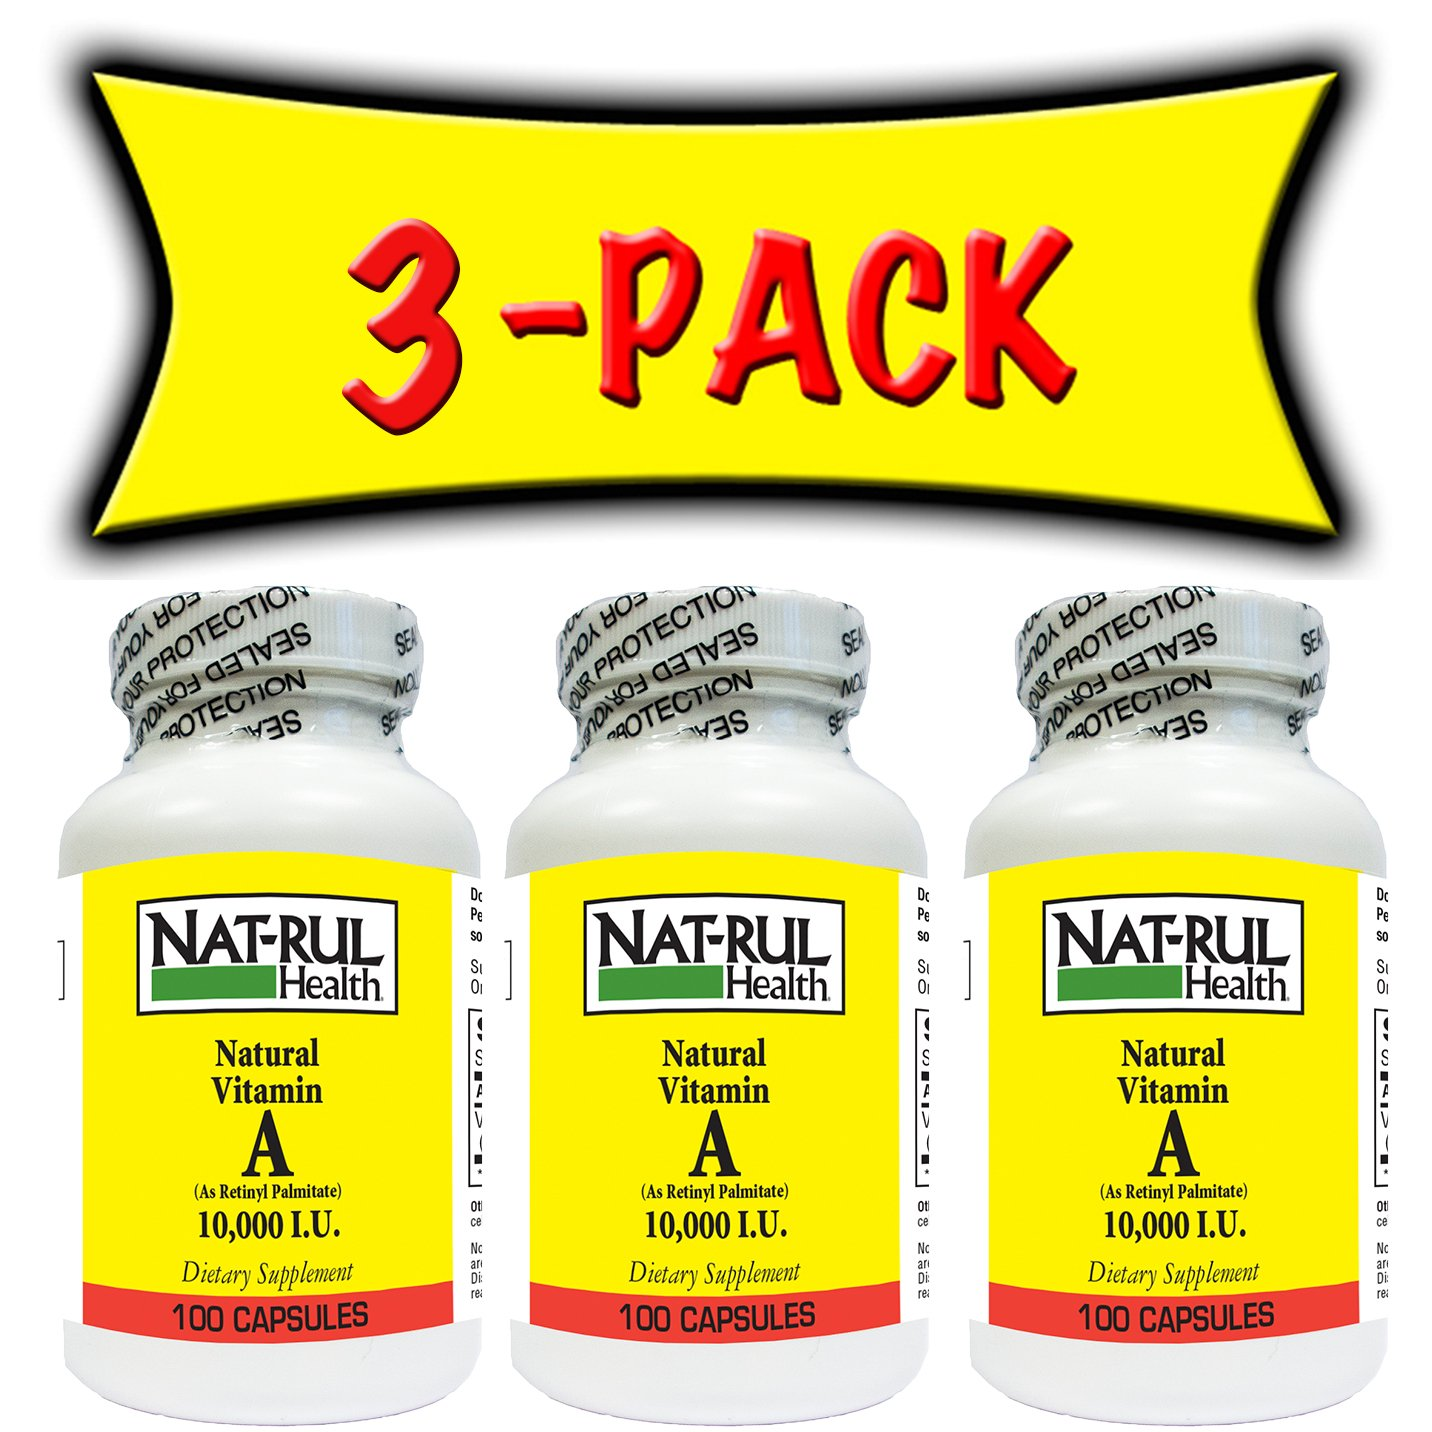 Nat-rul Health Vitamin A 10000iu 100 Capsules (3 PACK)